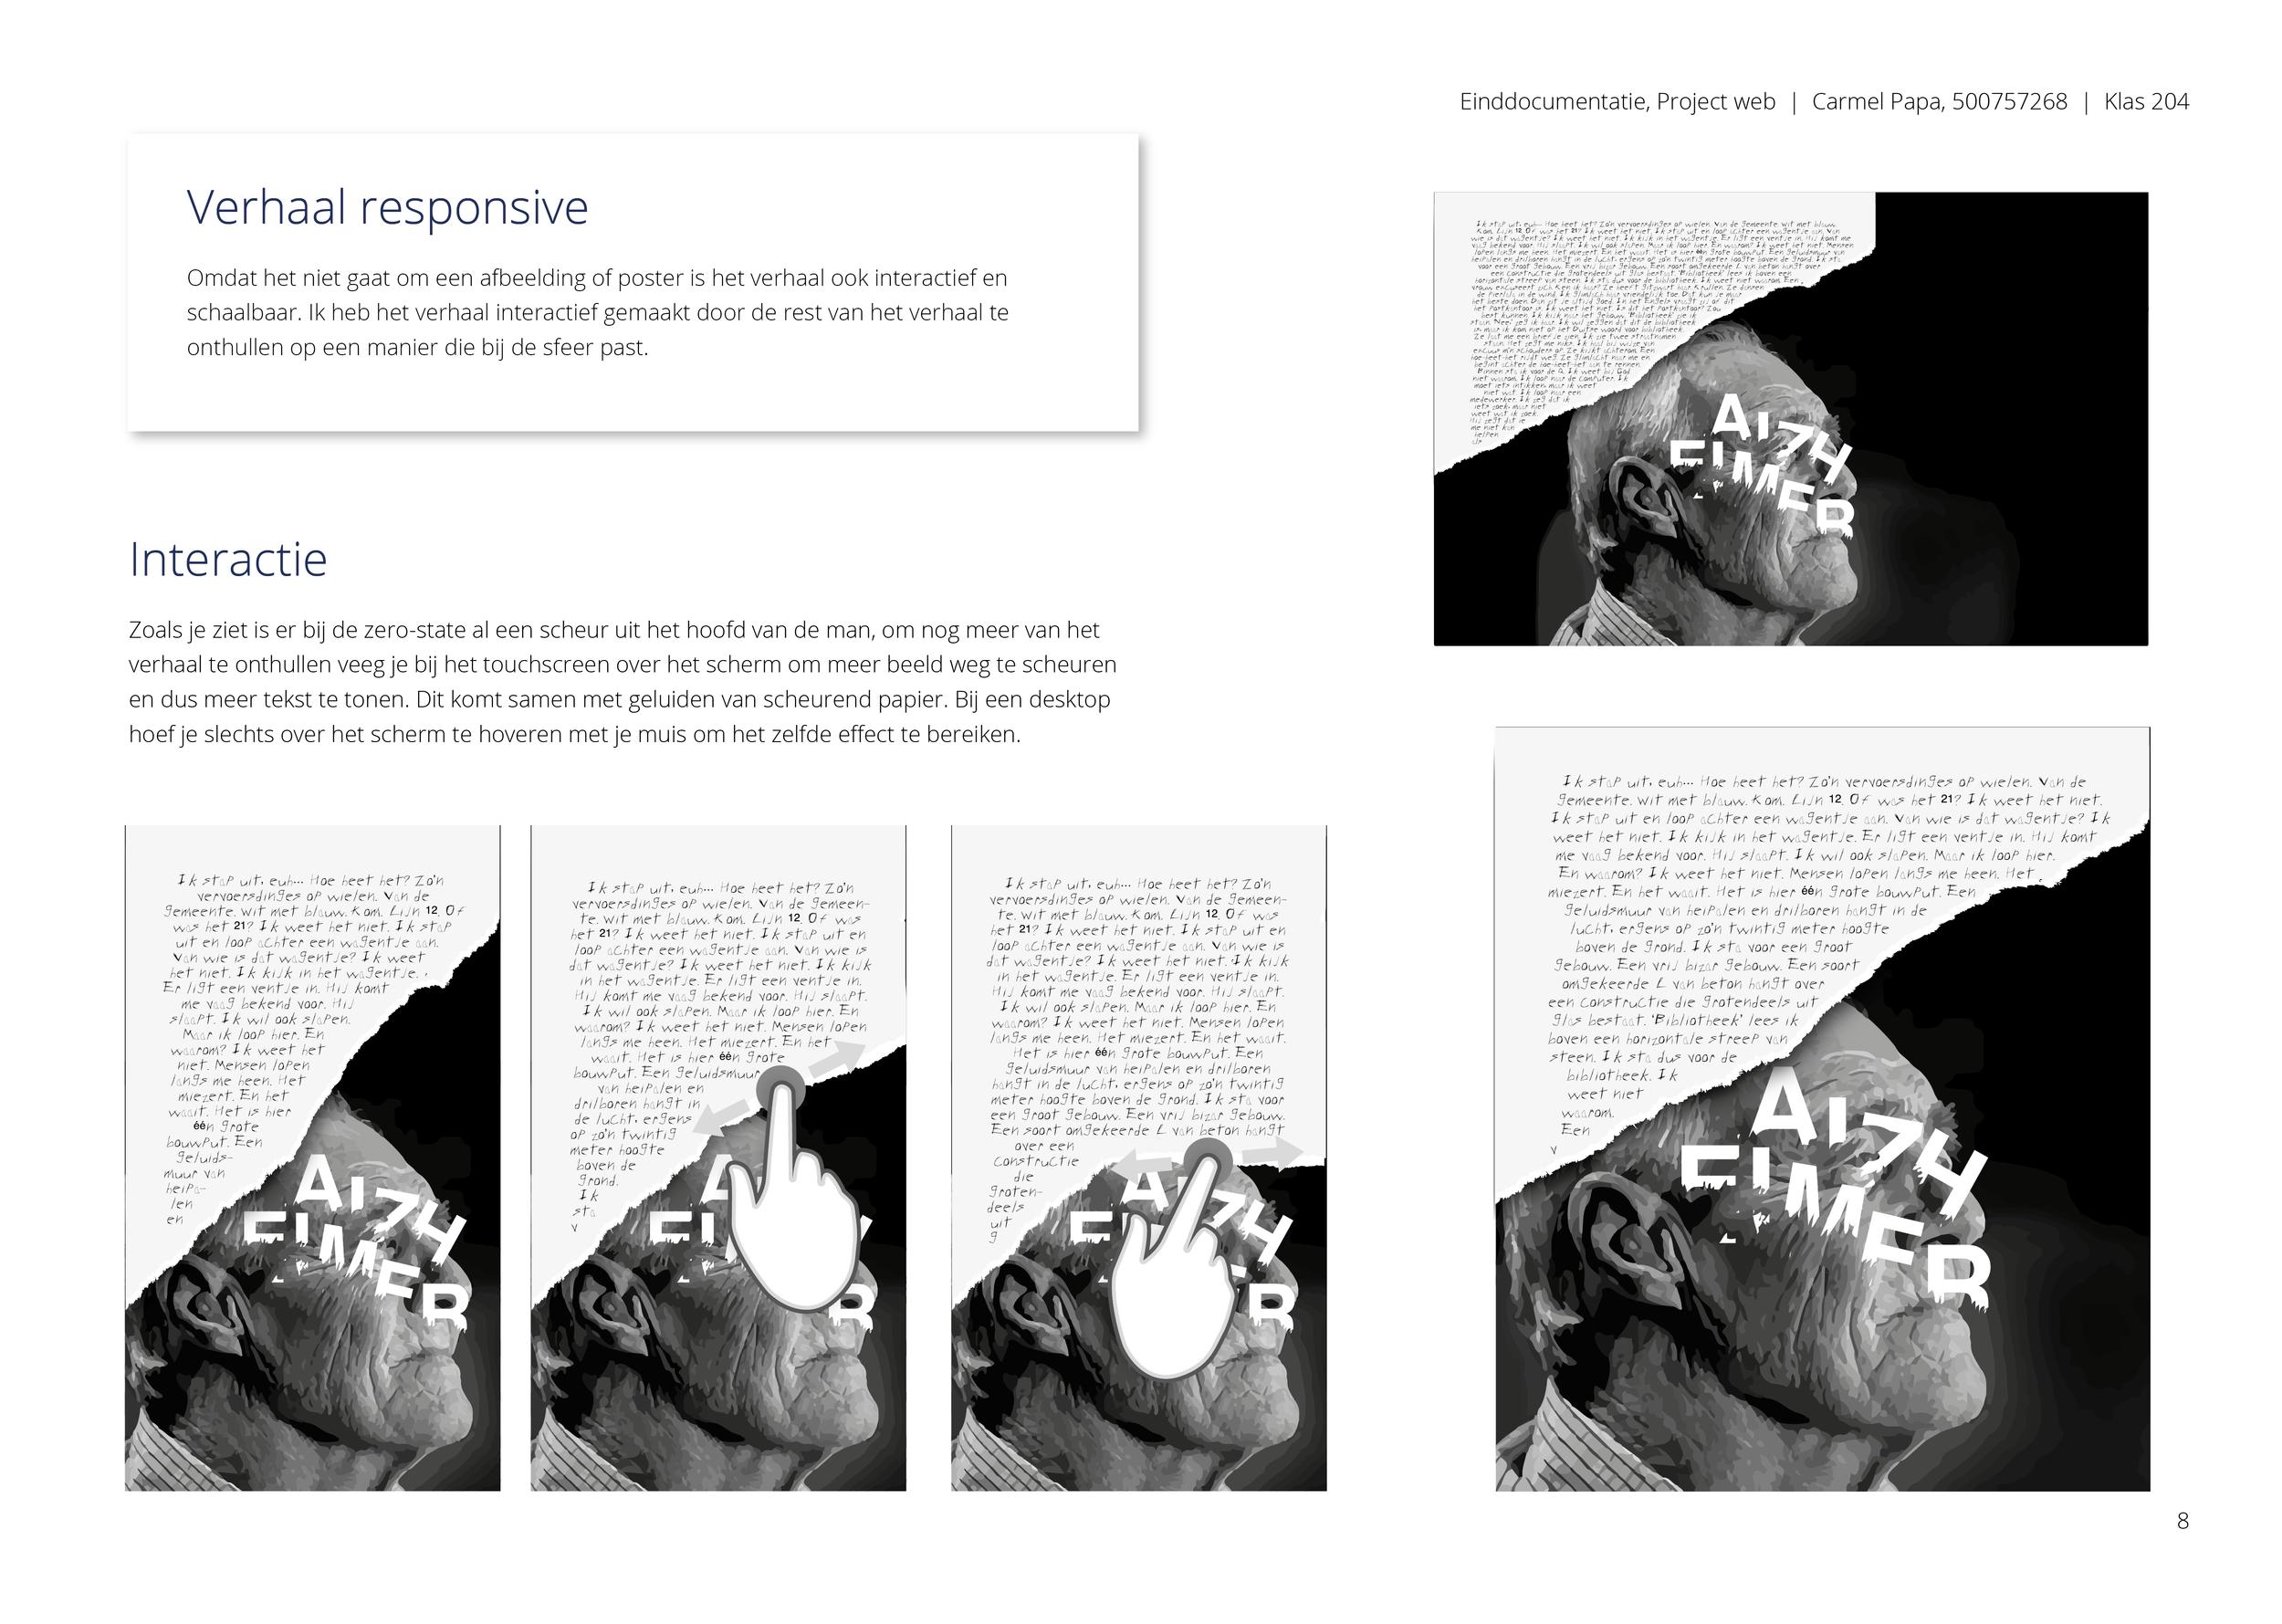 Einddocument_Project Web_Carmel Papa_204_Verhaal responsive.png